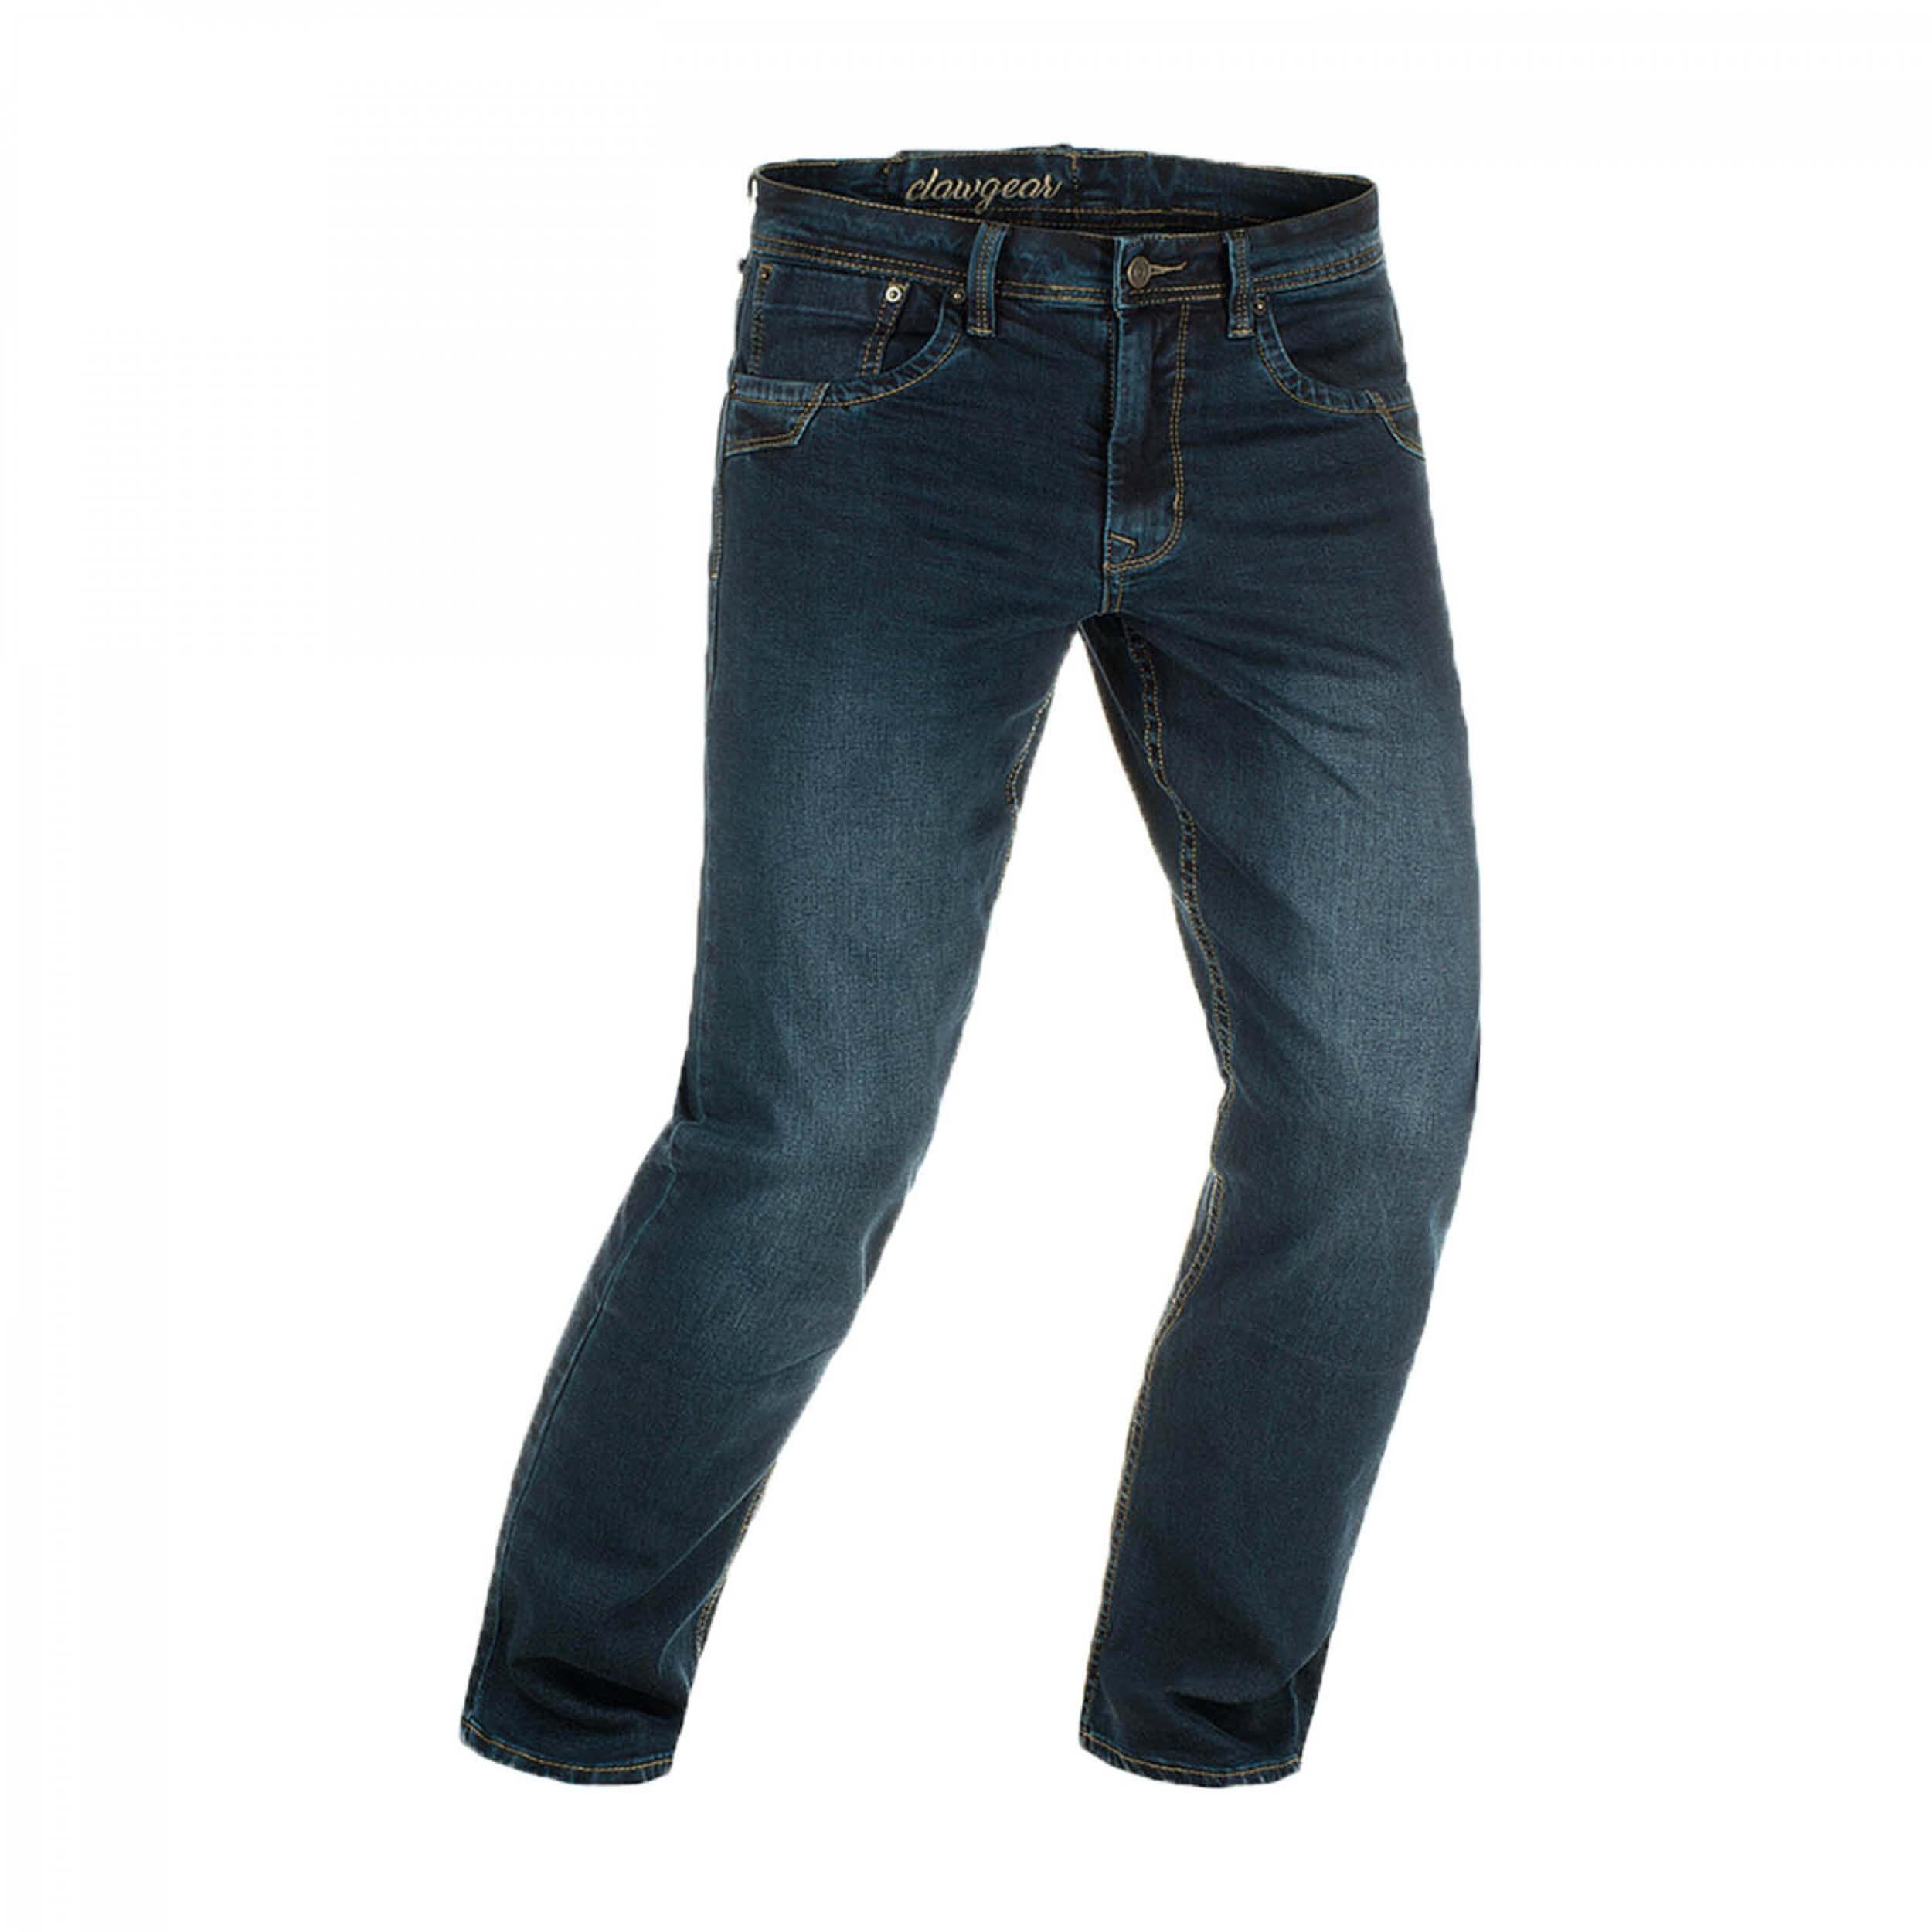 Clawgear Blue Denim Tactical Flex Jeans Washed Midnight